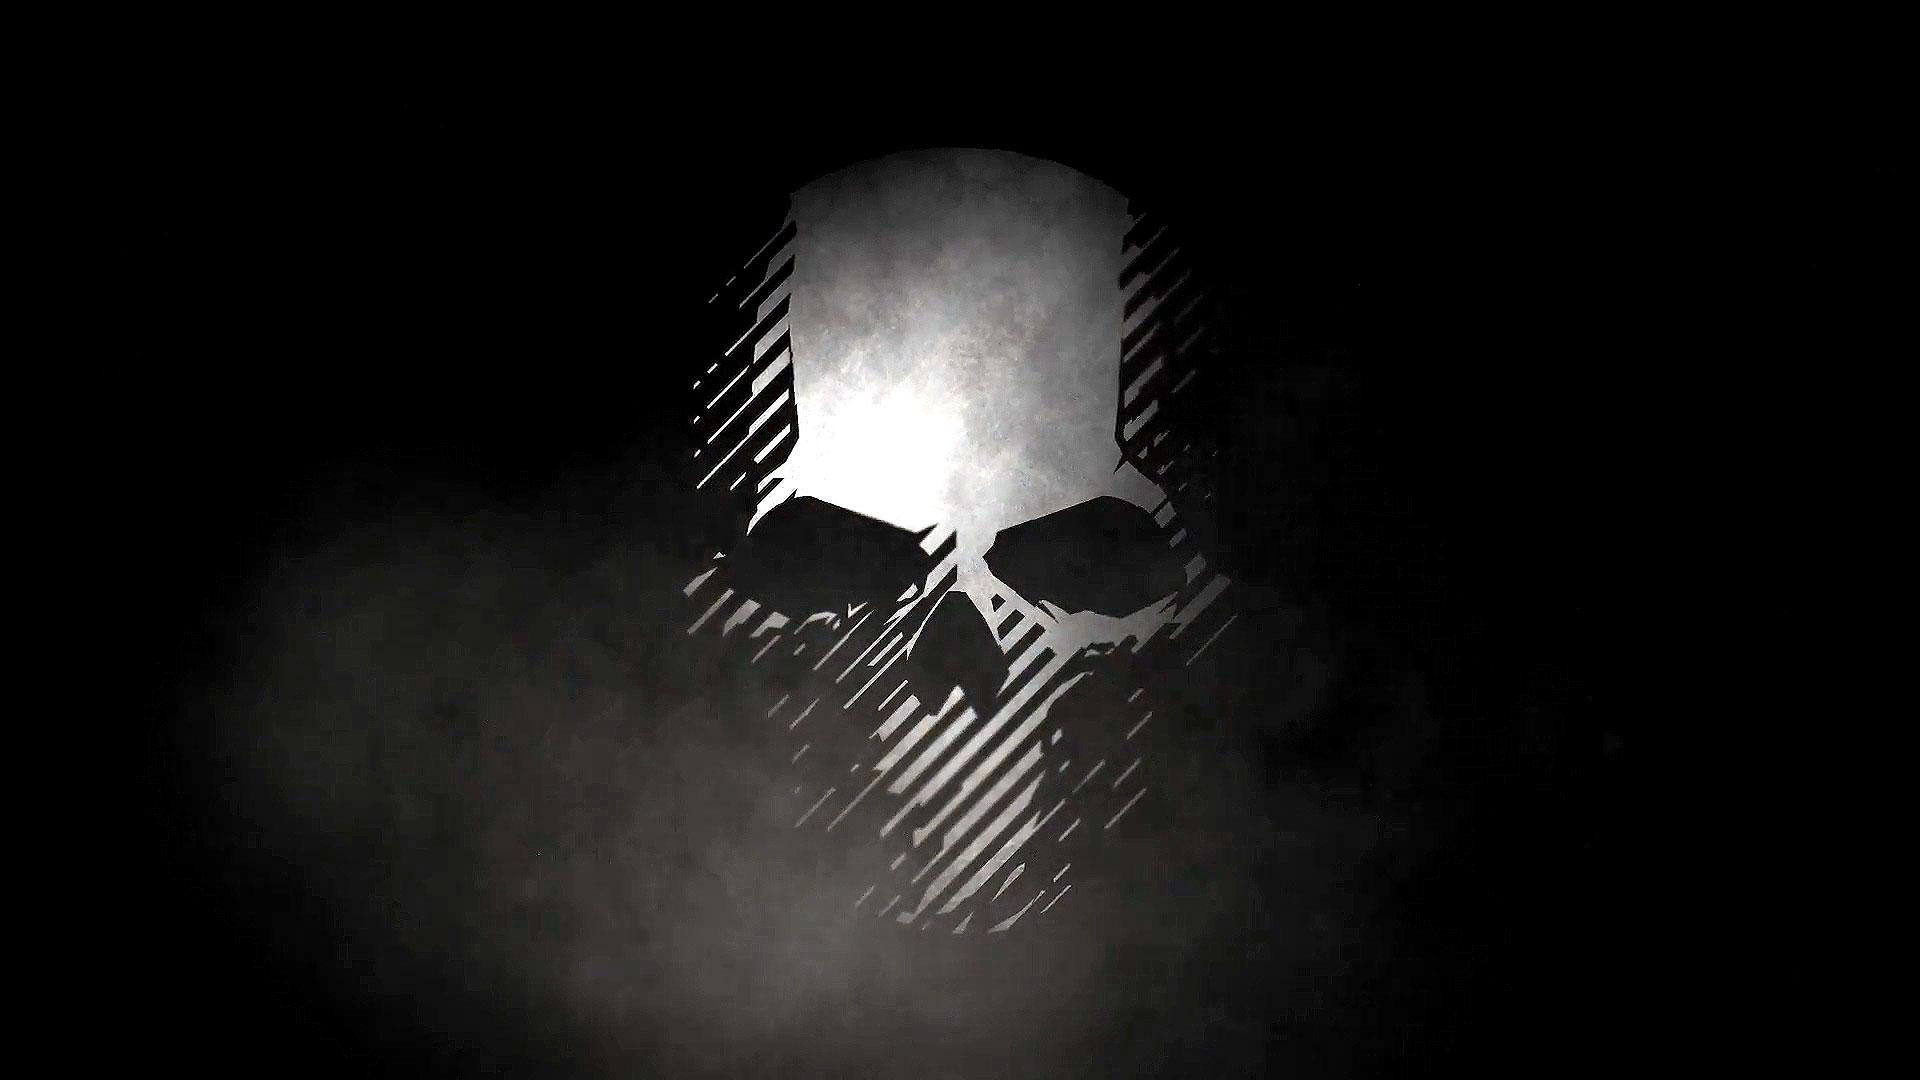 New Skull Wallpaper Request | Forums